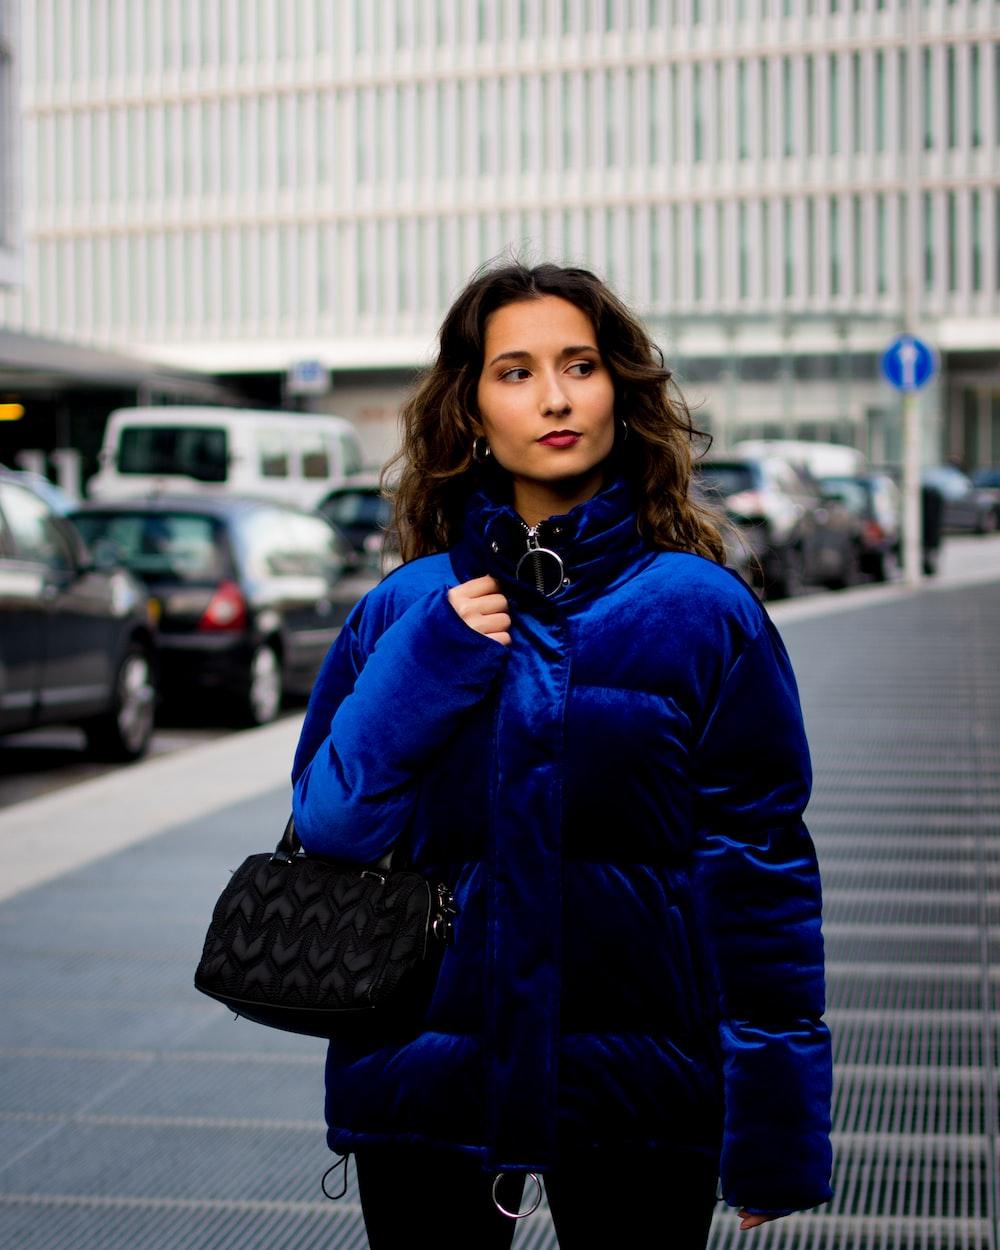 woman's blue velvet jacket